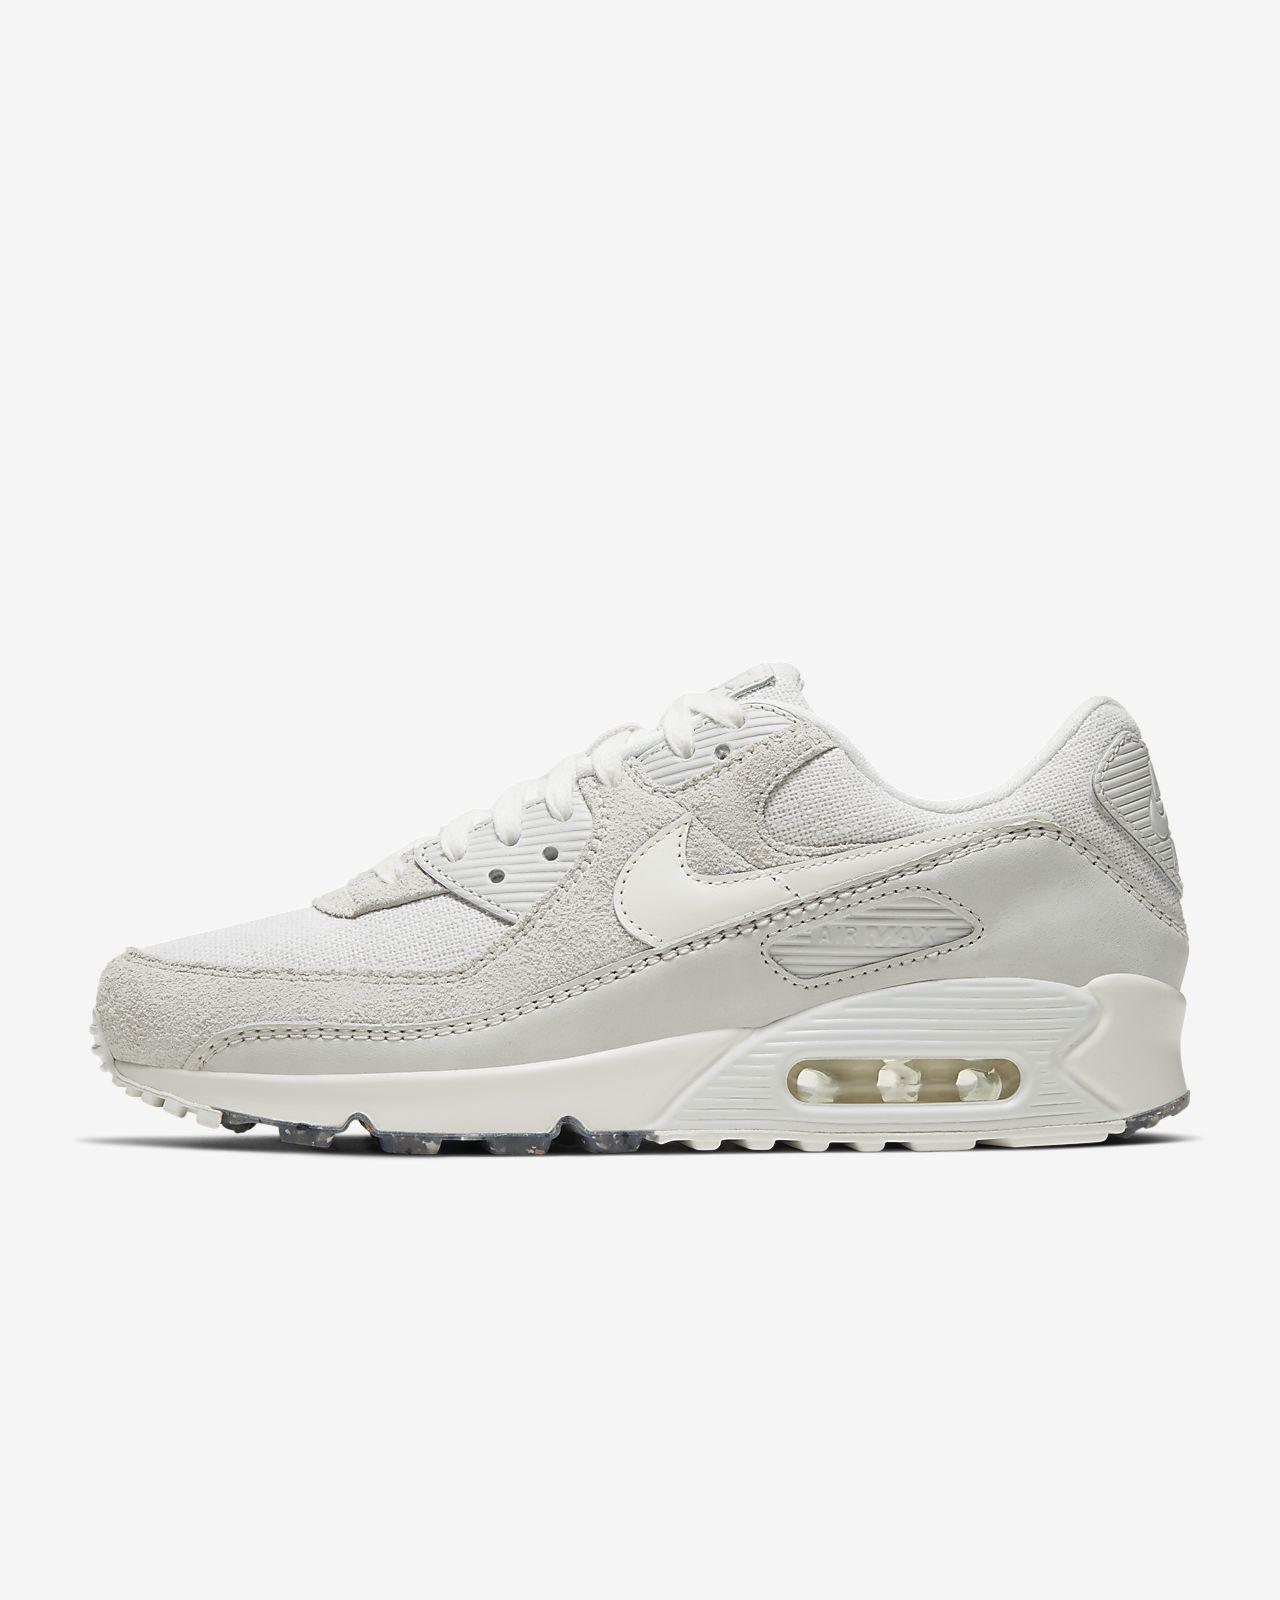 popular Comprometido Casa  NIKE Official]Nike Air Max 90 Men's Shoe.Online store (mail order ...